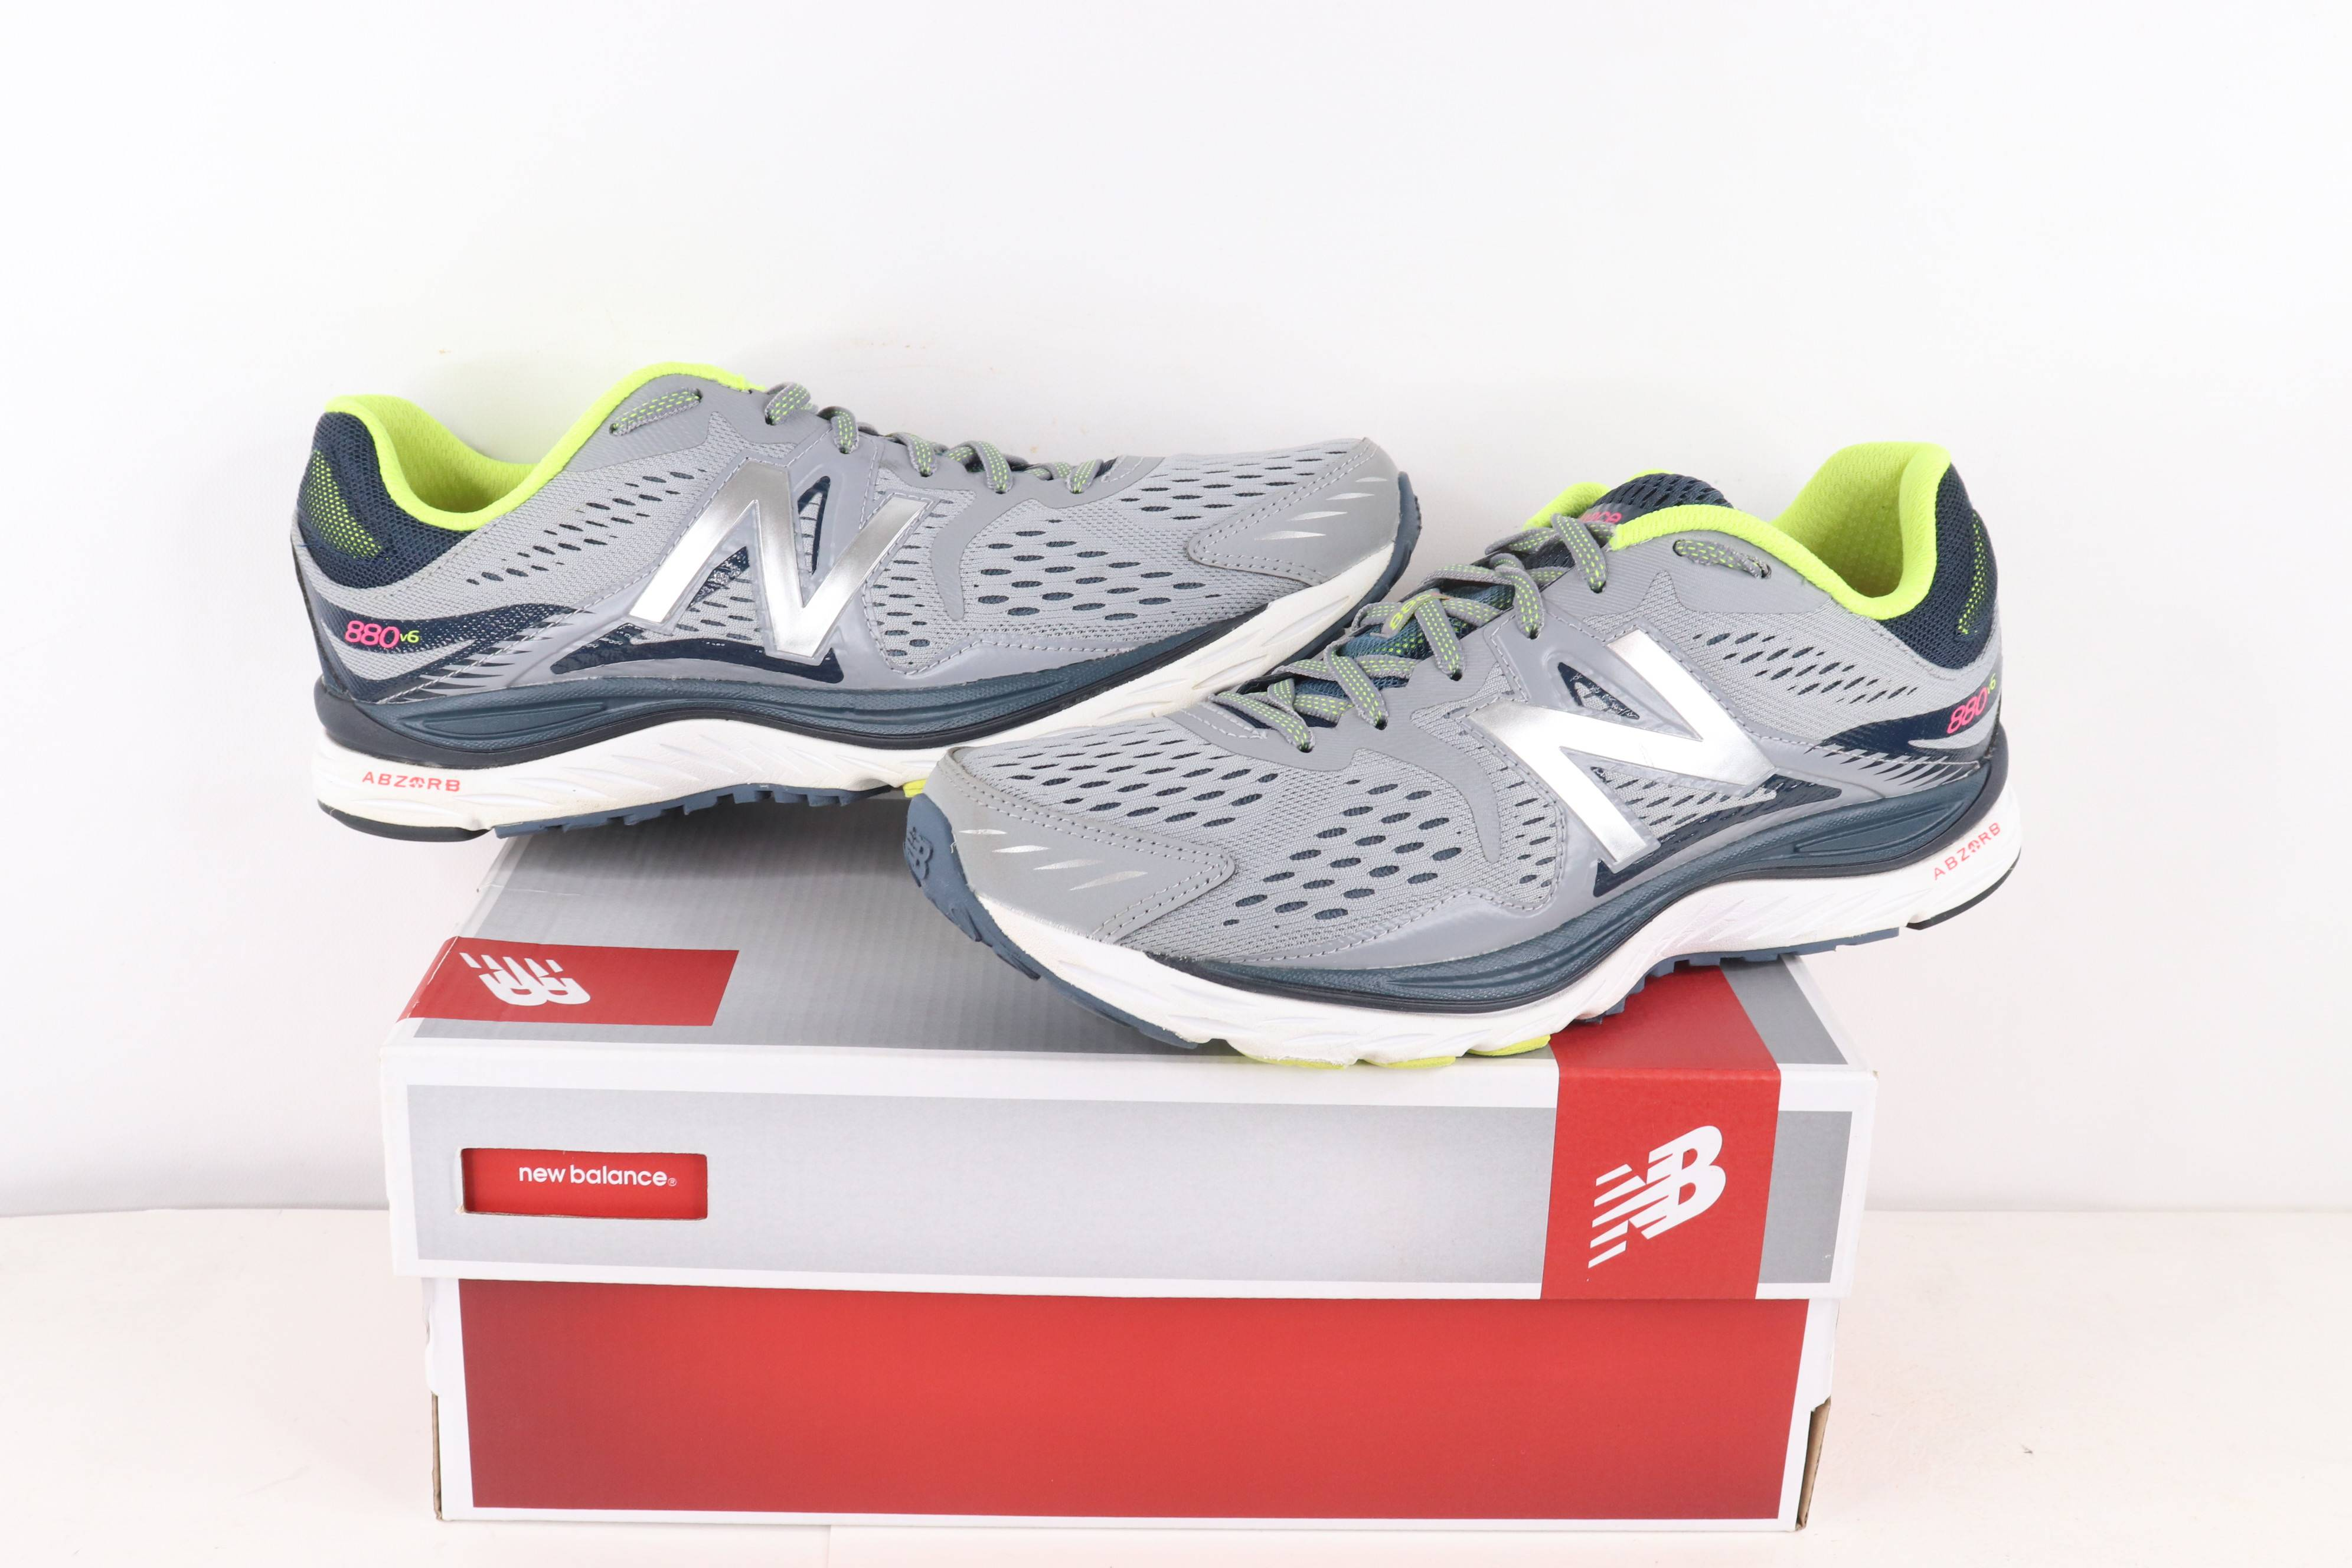 New Balance 880 v6 Gym Jogging Running Shoes Gray Size 10